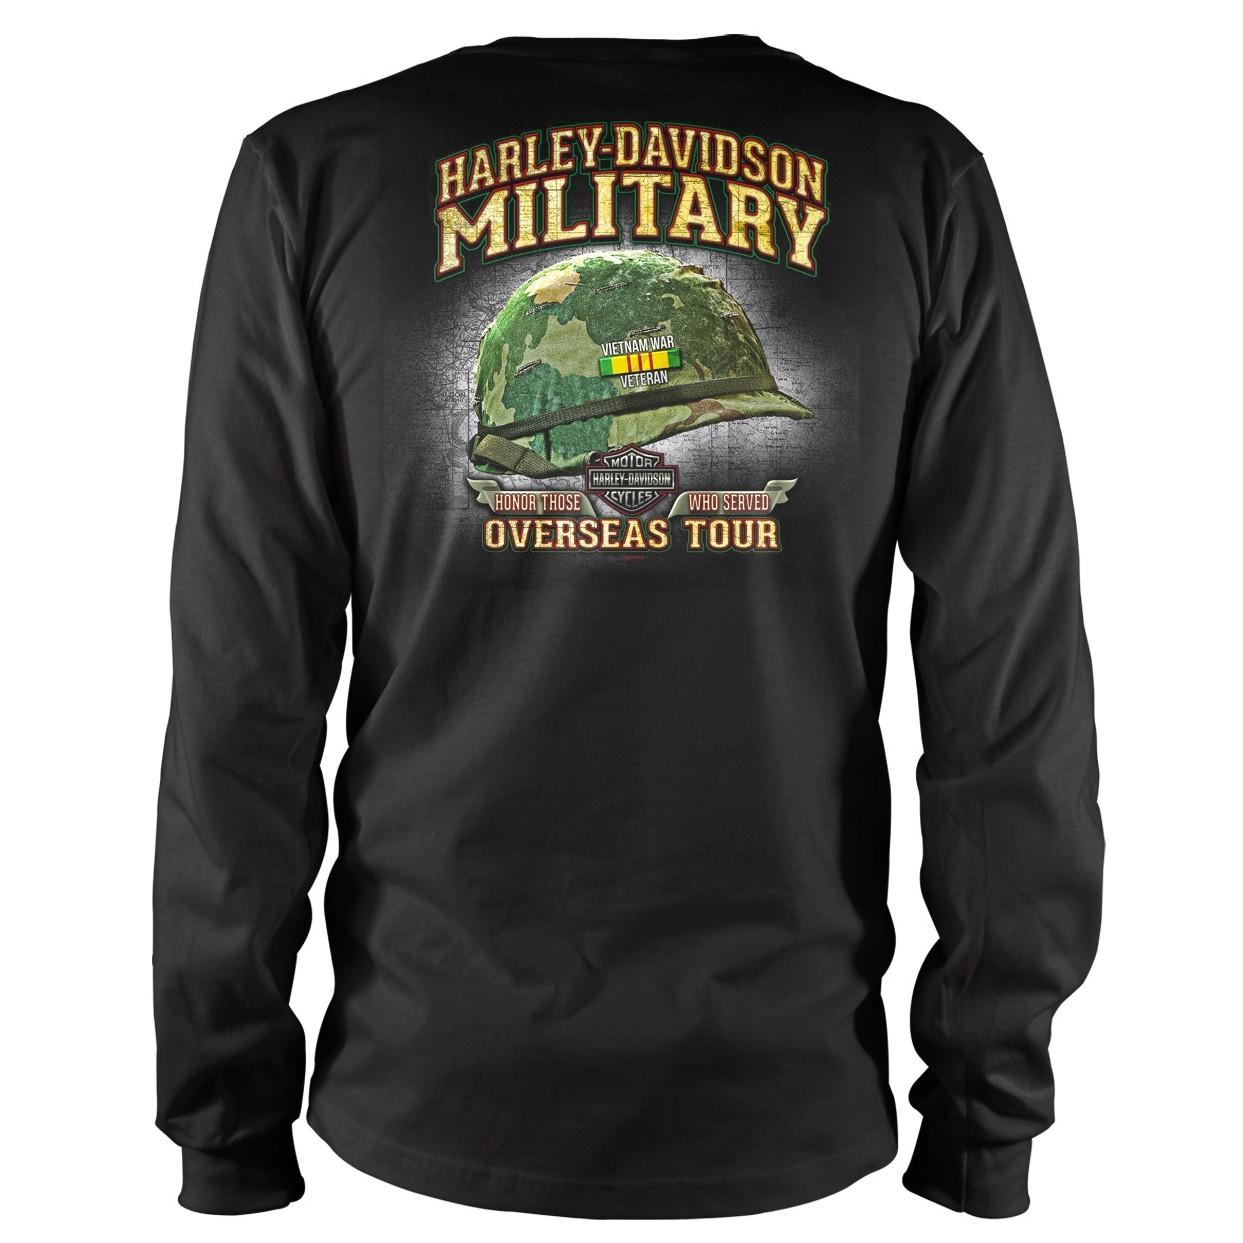 Men's Black Bar & Shield Long-Sleeve Graphic T-Shirt - Honoring Vietnam Veterans